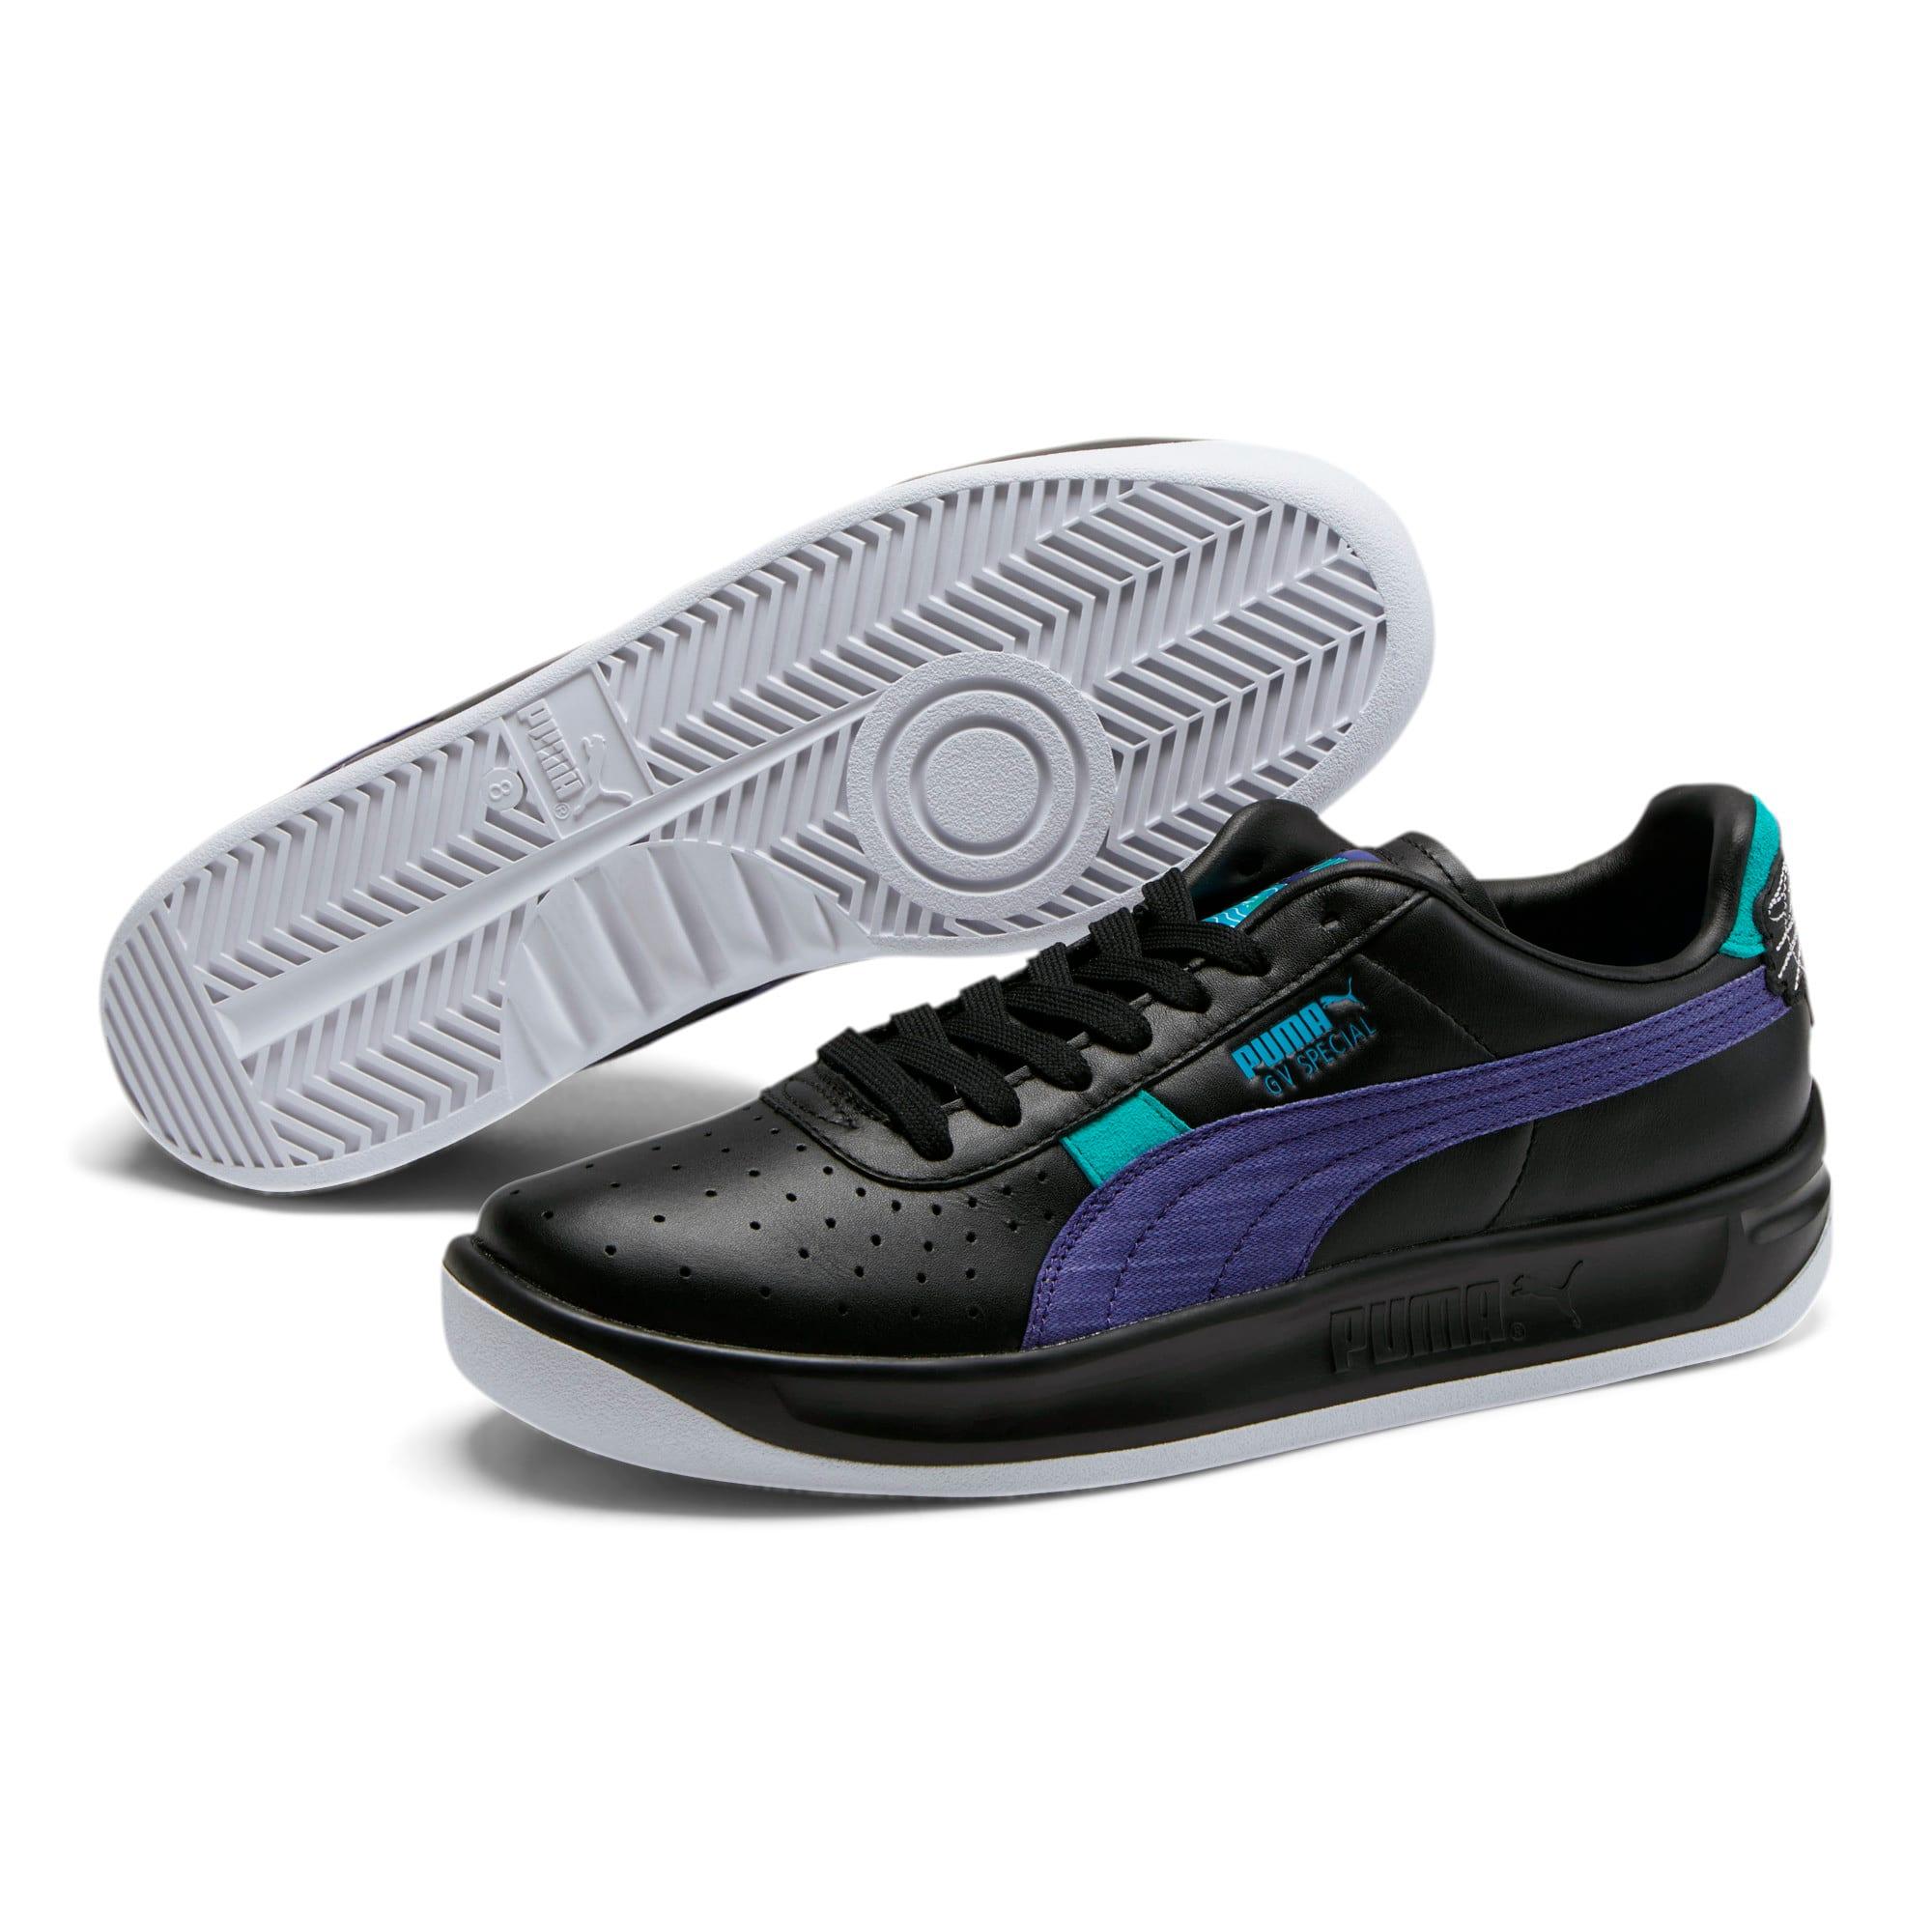 best service 27f59 8aa75 GV Special + Last Dayz Men's Sneakers